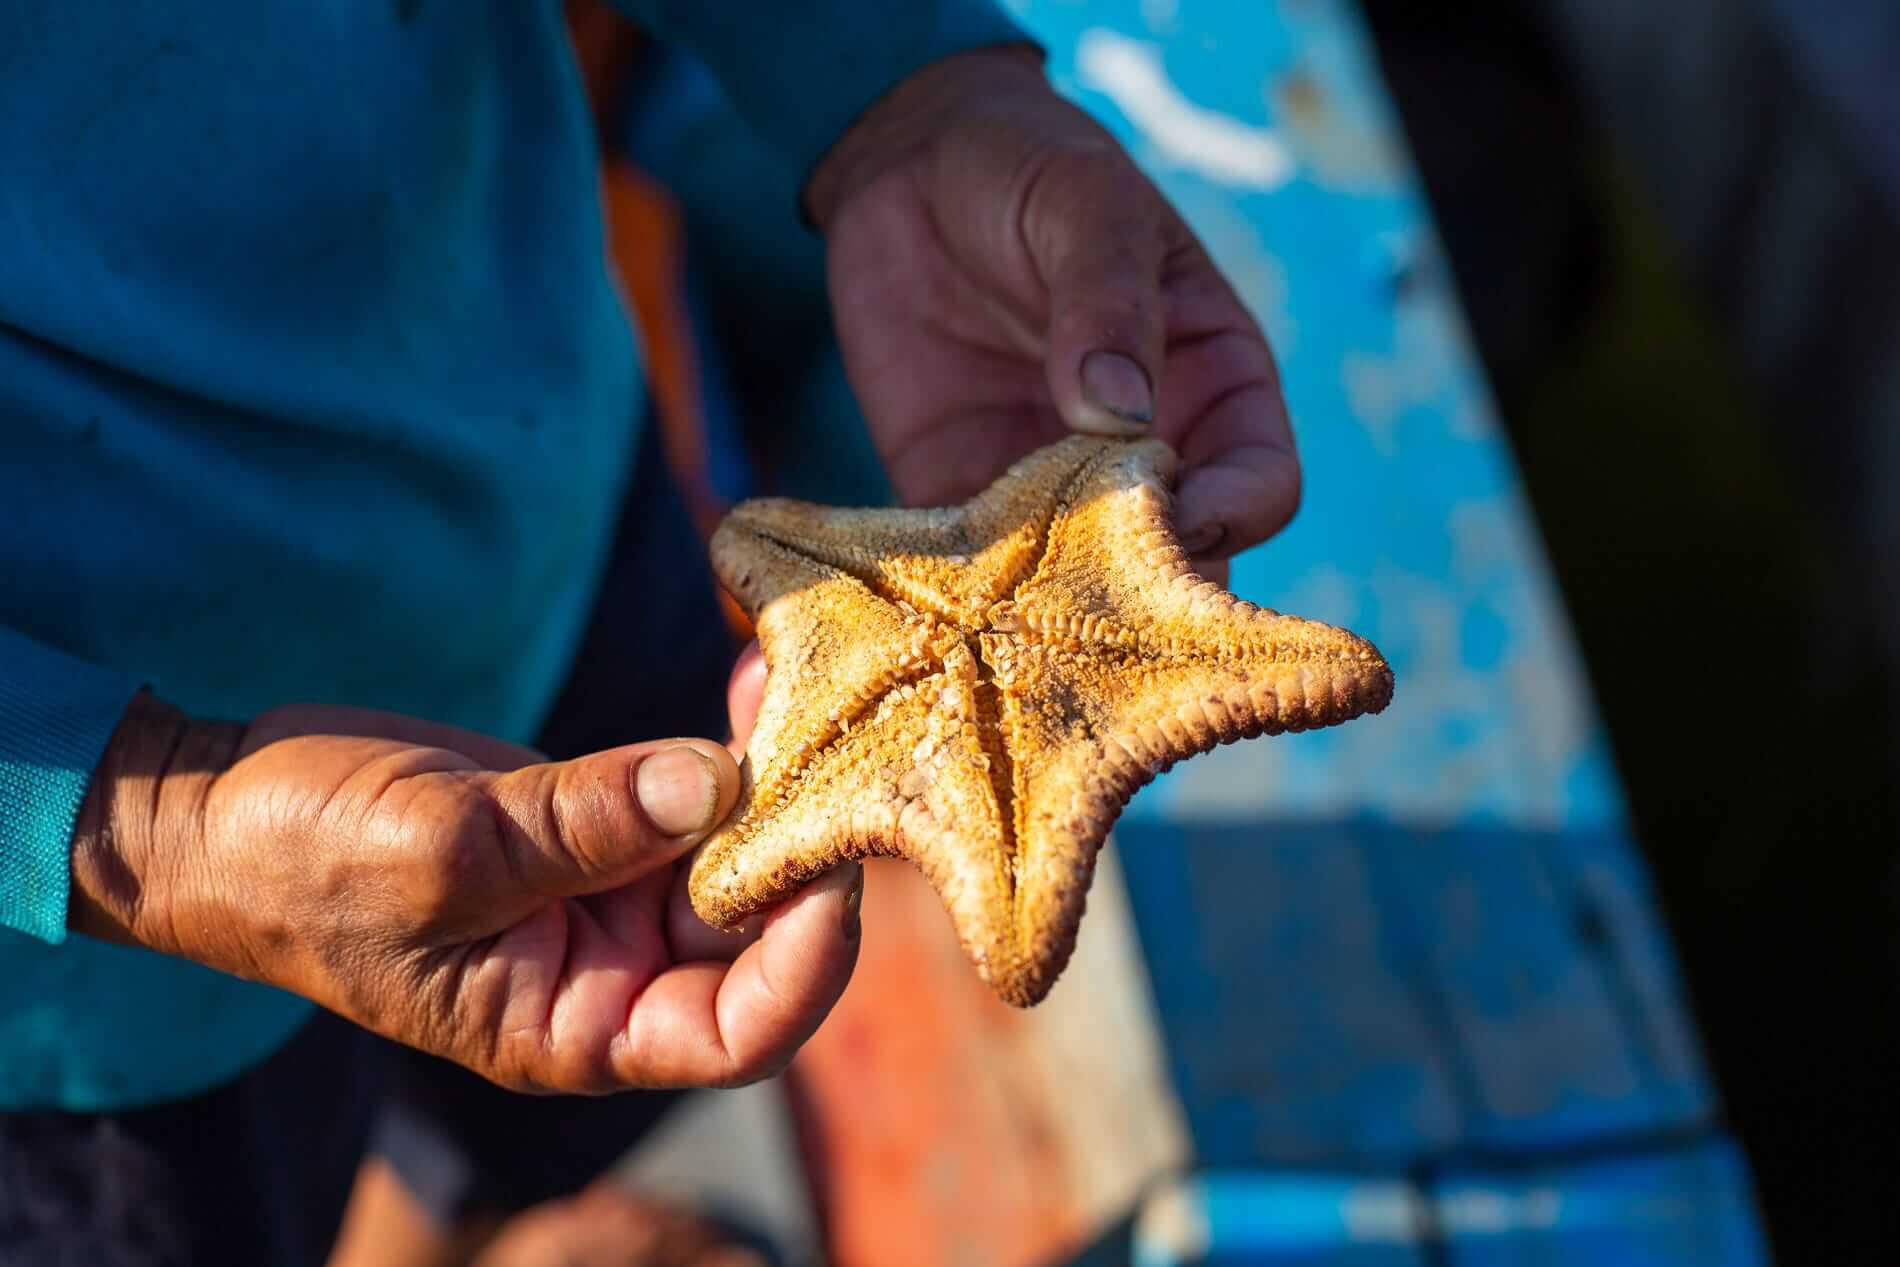 A fisherman holding a starfish